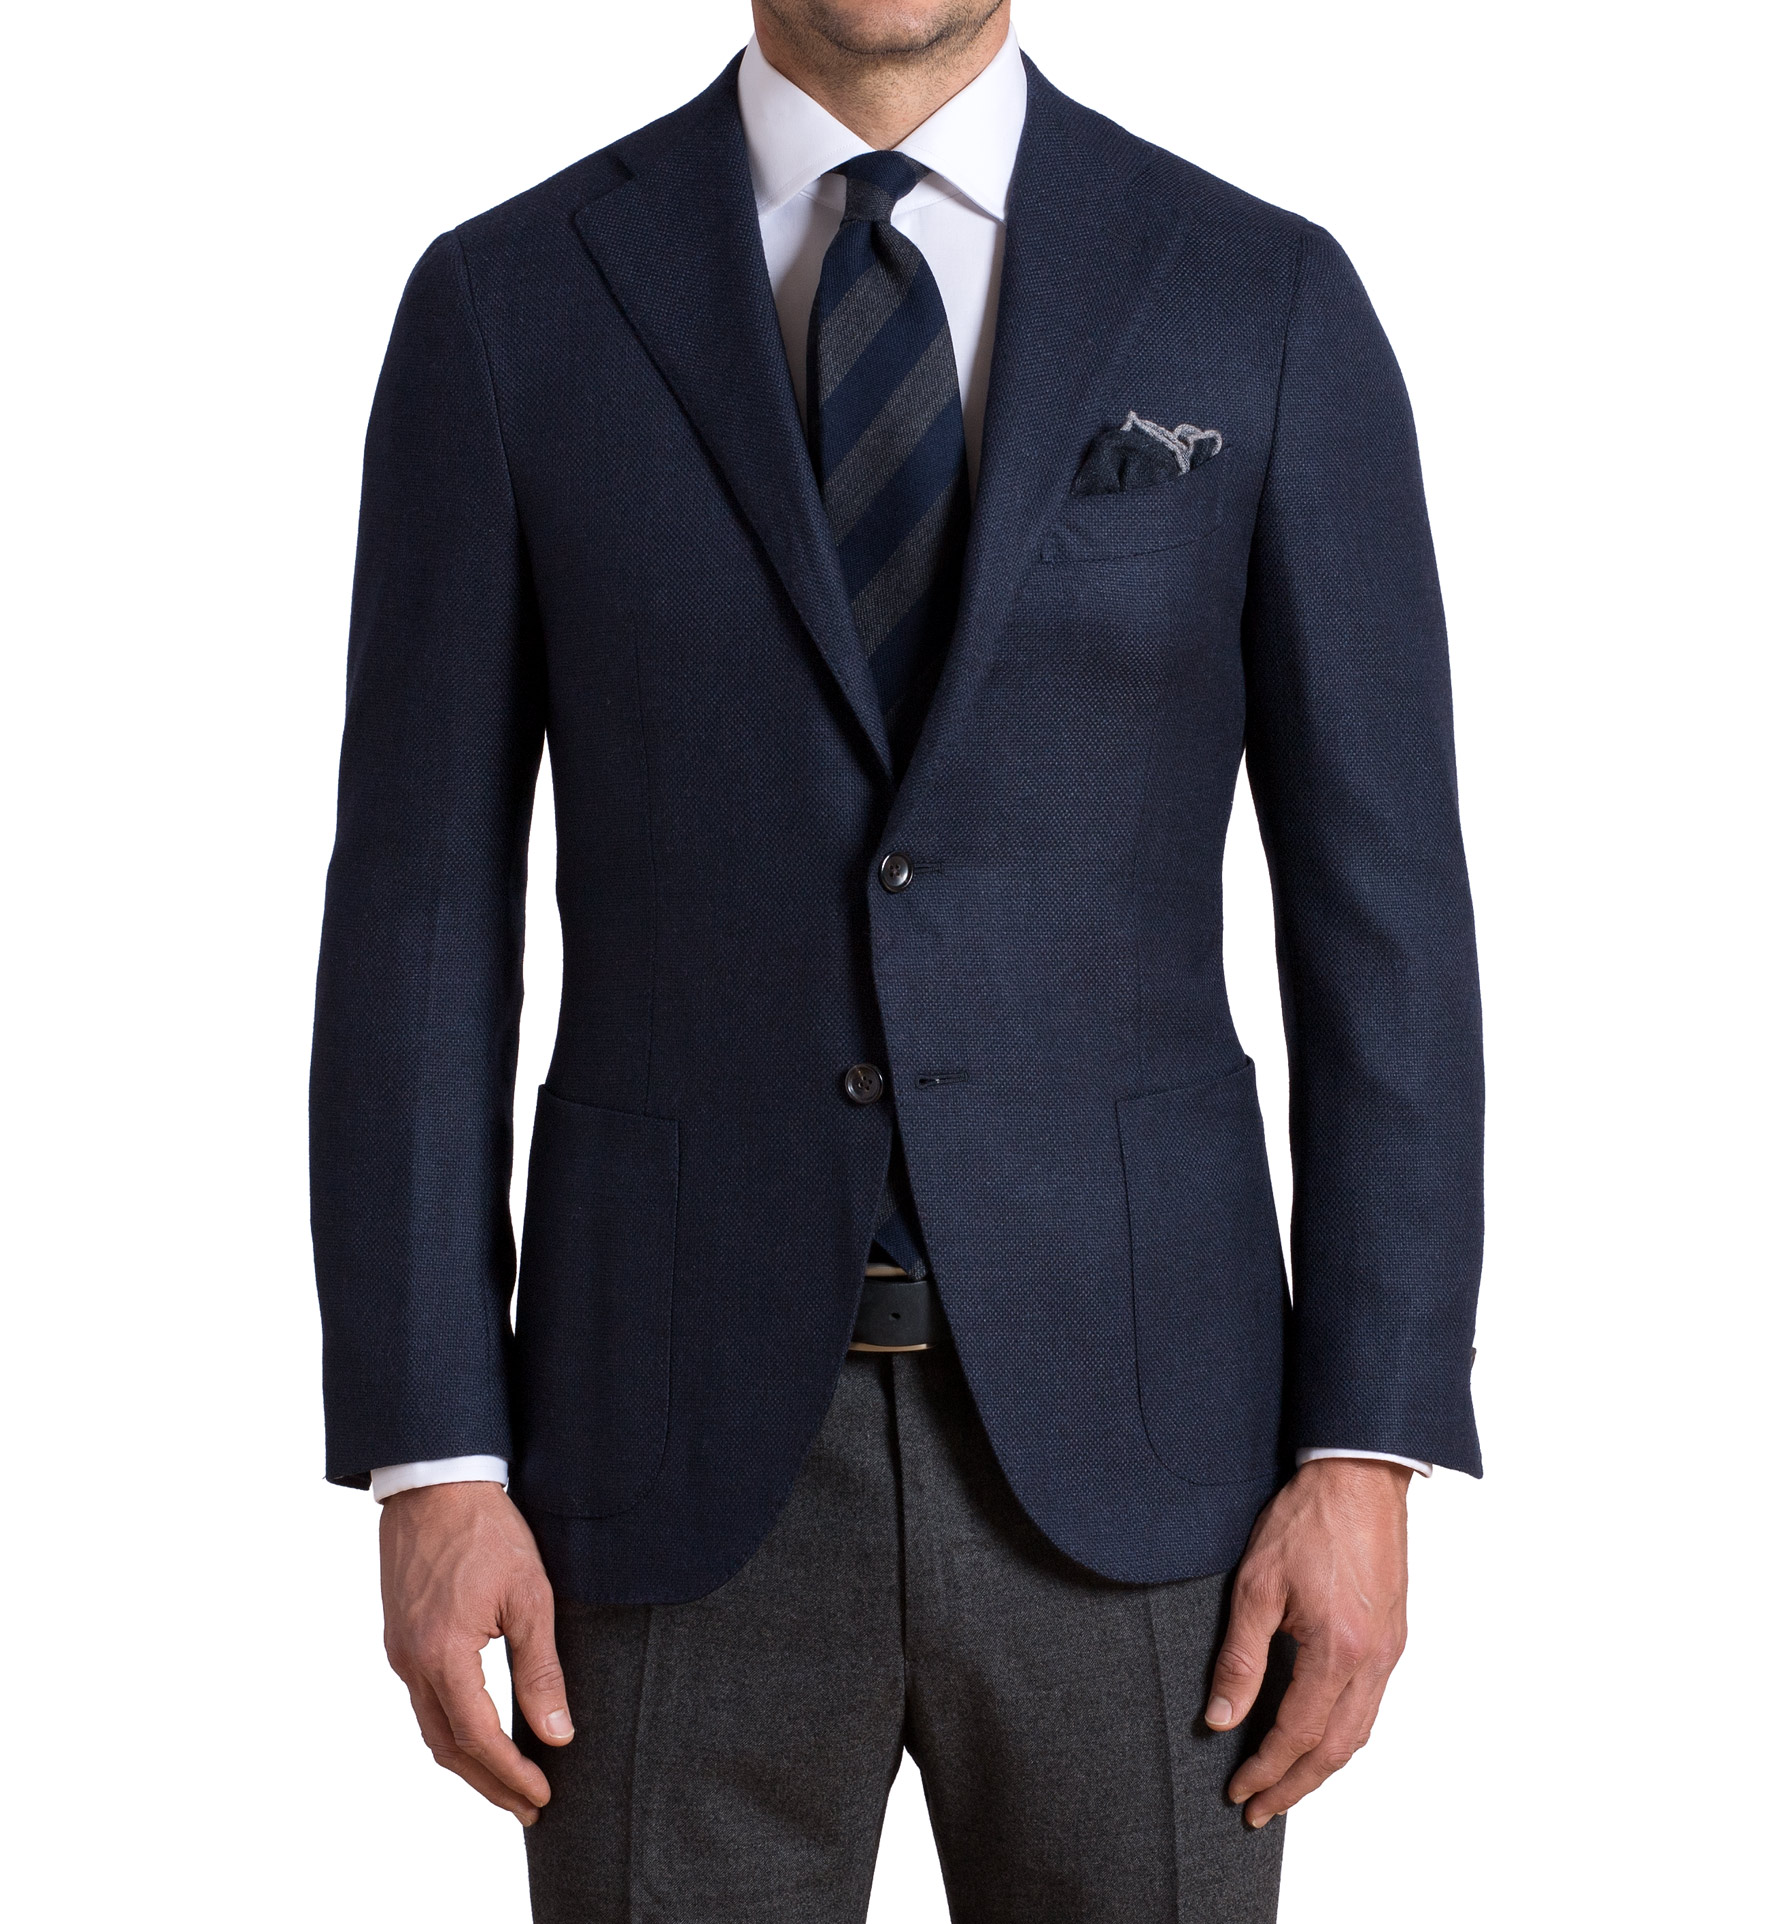 Zoom Image of Hudson Navy Wool and Cashmere Hopsack Jacket